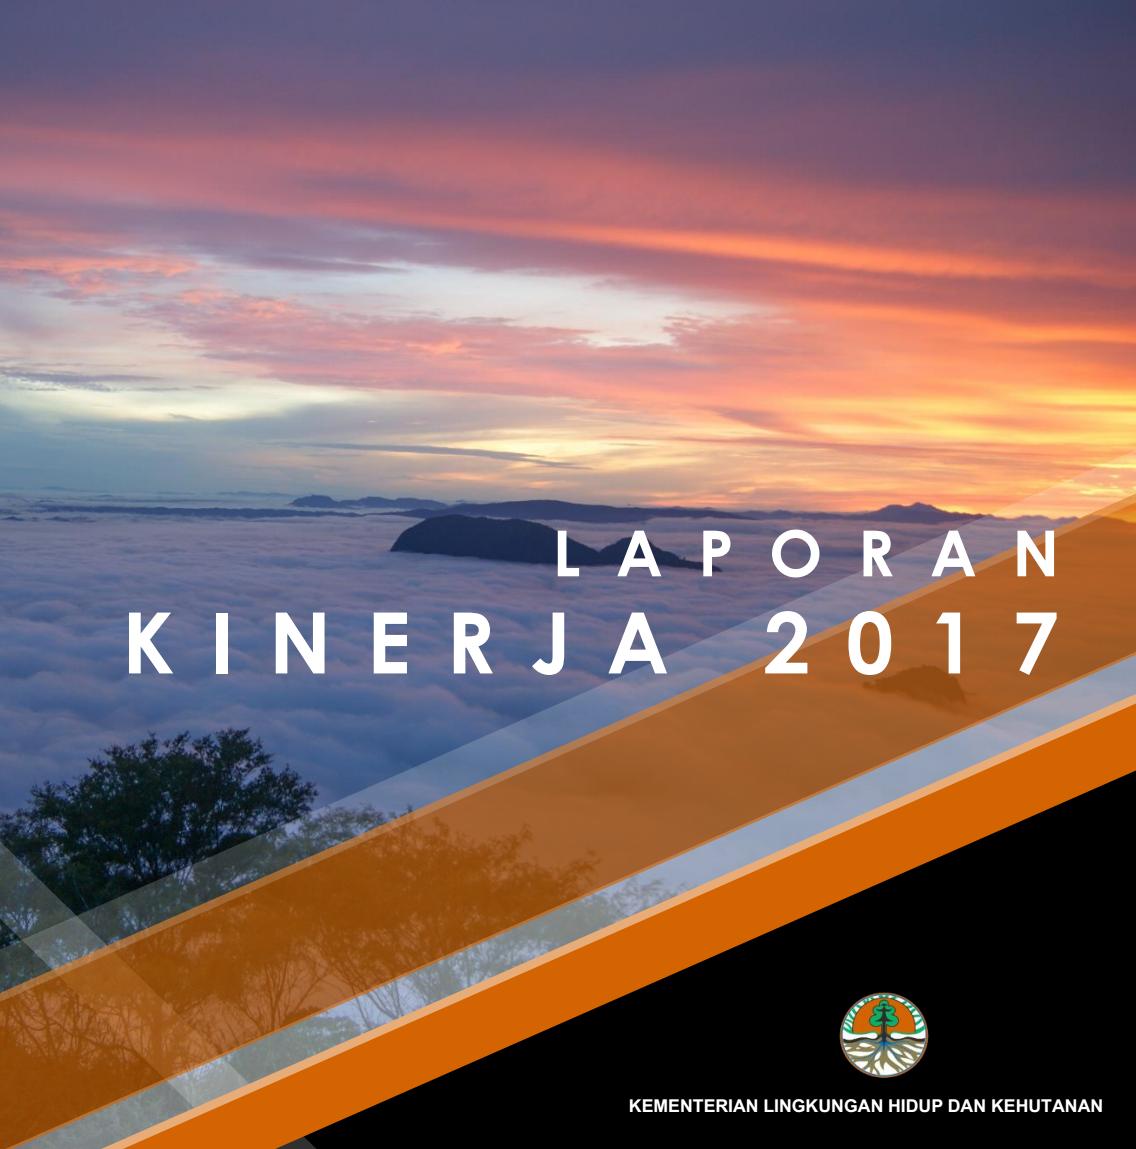 Laporan Kinerja Kementerian Lingkungan Hidup dan Kehutanan Tahun 2017